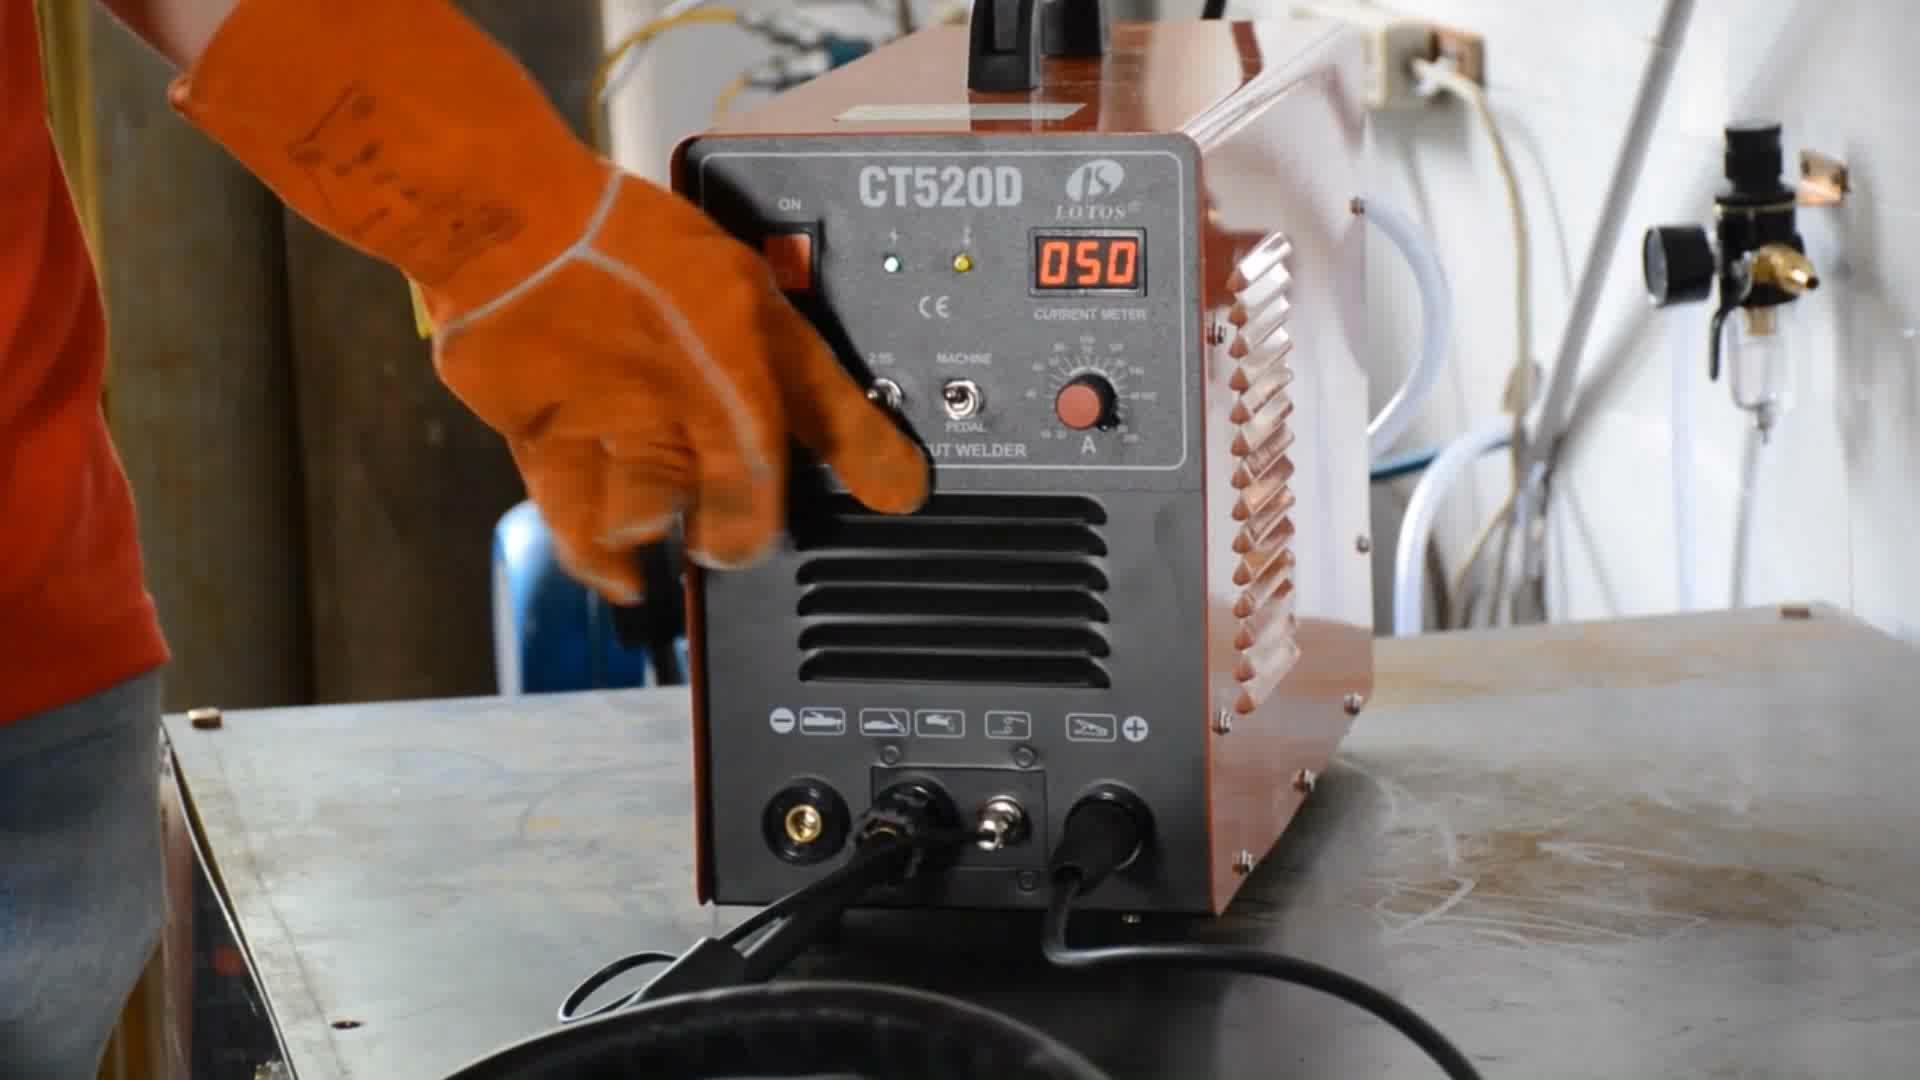 Lotos CT520D portatile taglio al plasma mosfet mig tig saldatore combo automatico impulso argon saldatura ad arco macchina